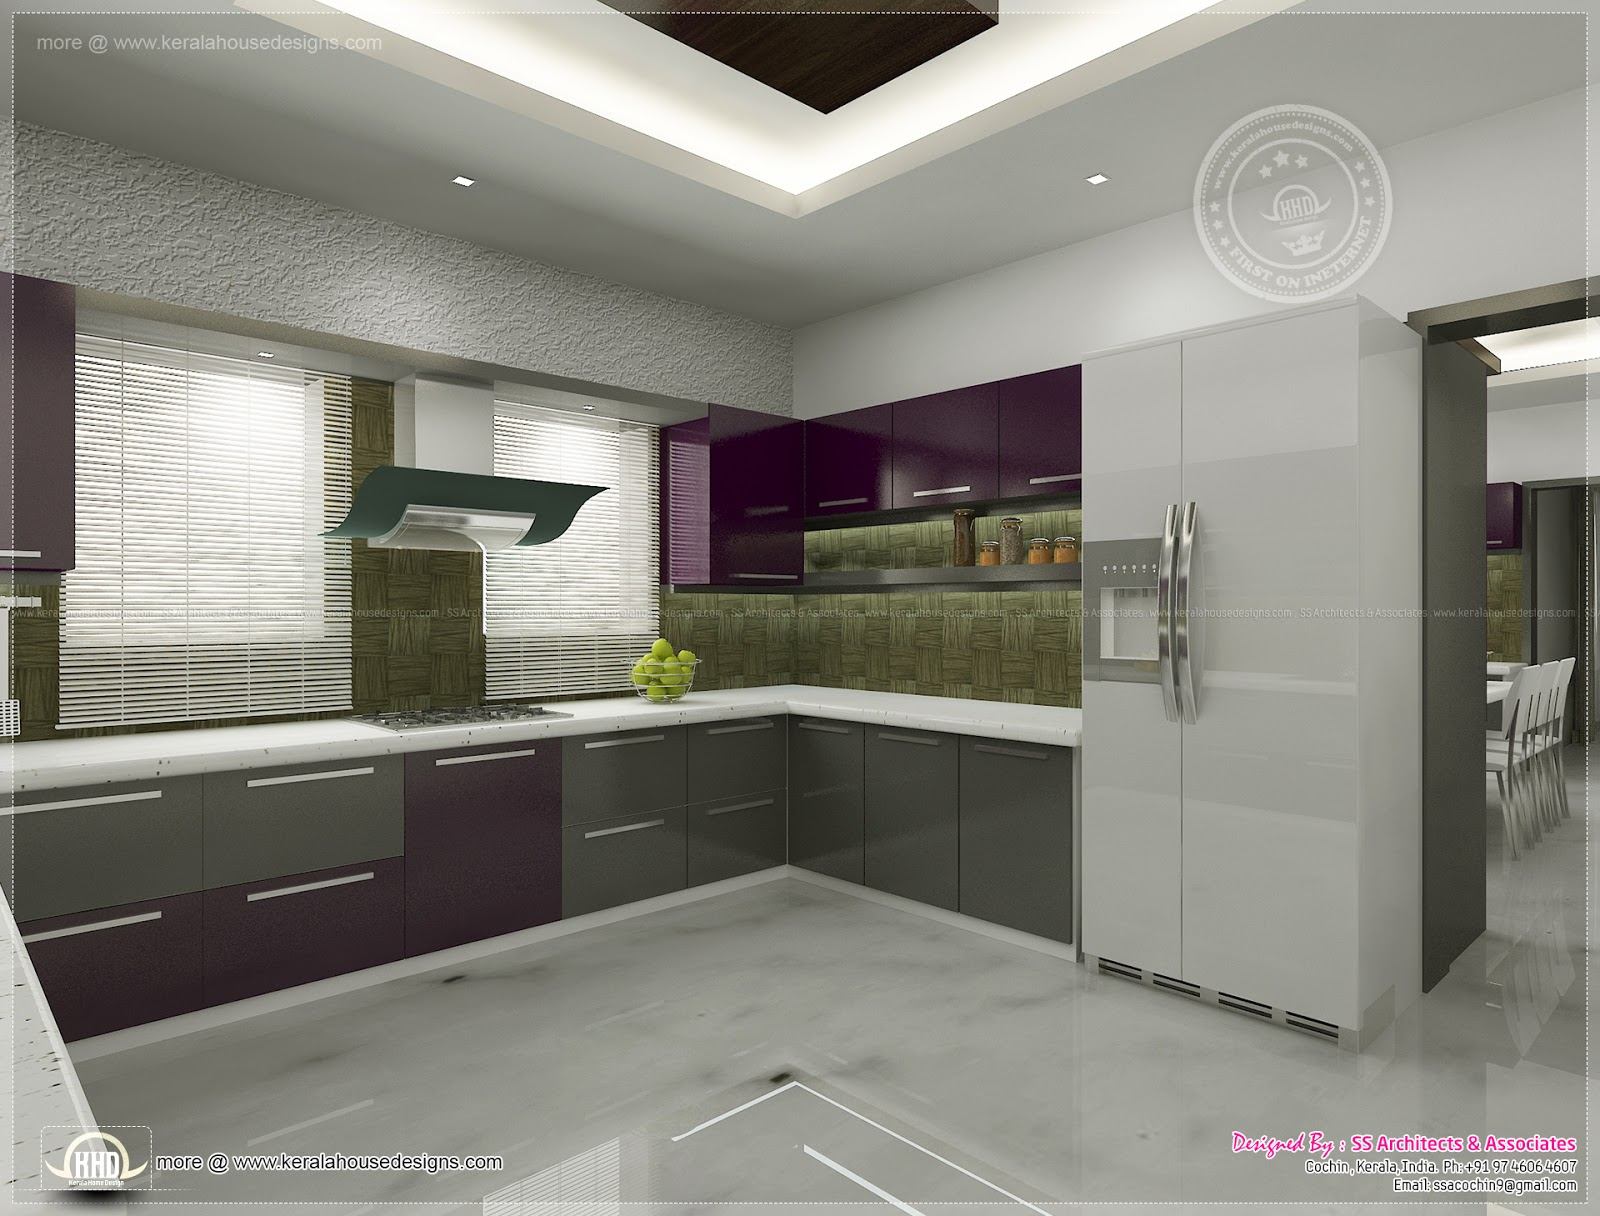 Kitchen interior views by SS Architects Cochin  Kerala